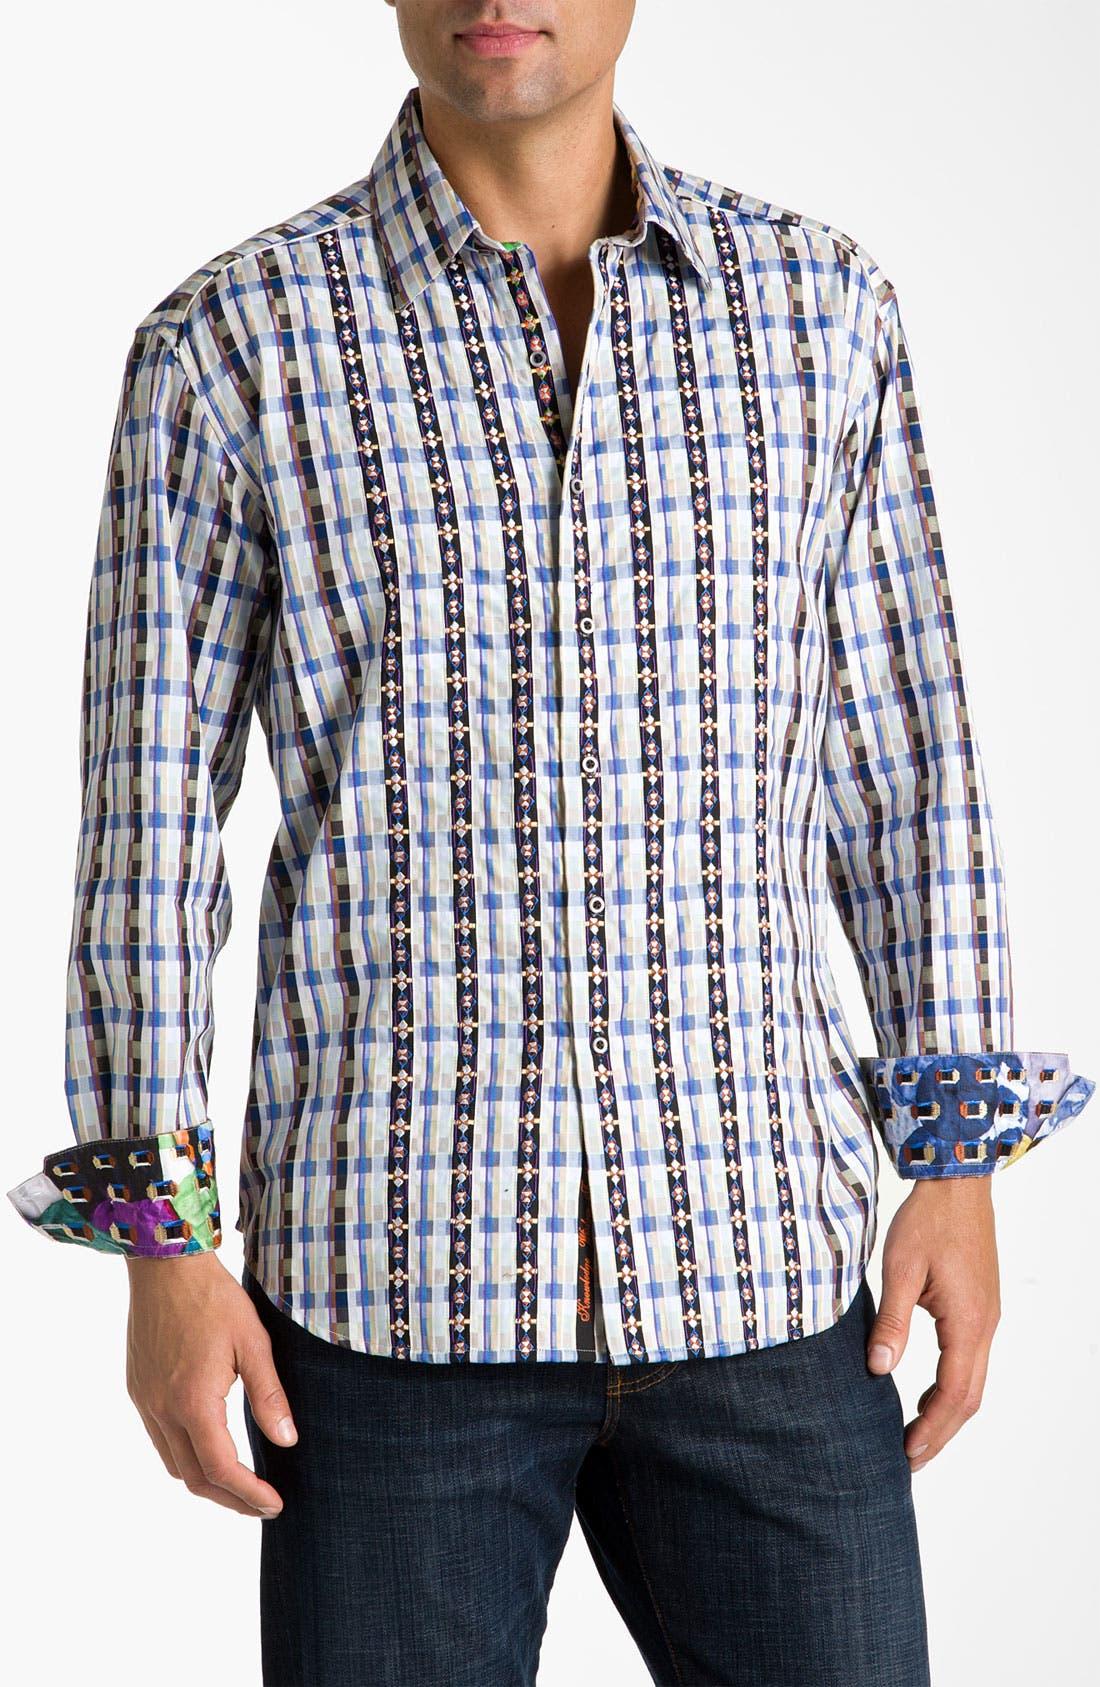 Alternate Image 1 Selected - Robert Graham 'Escalade' Sport Shirt